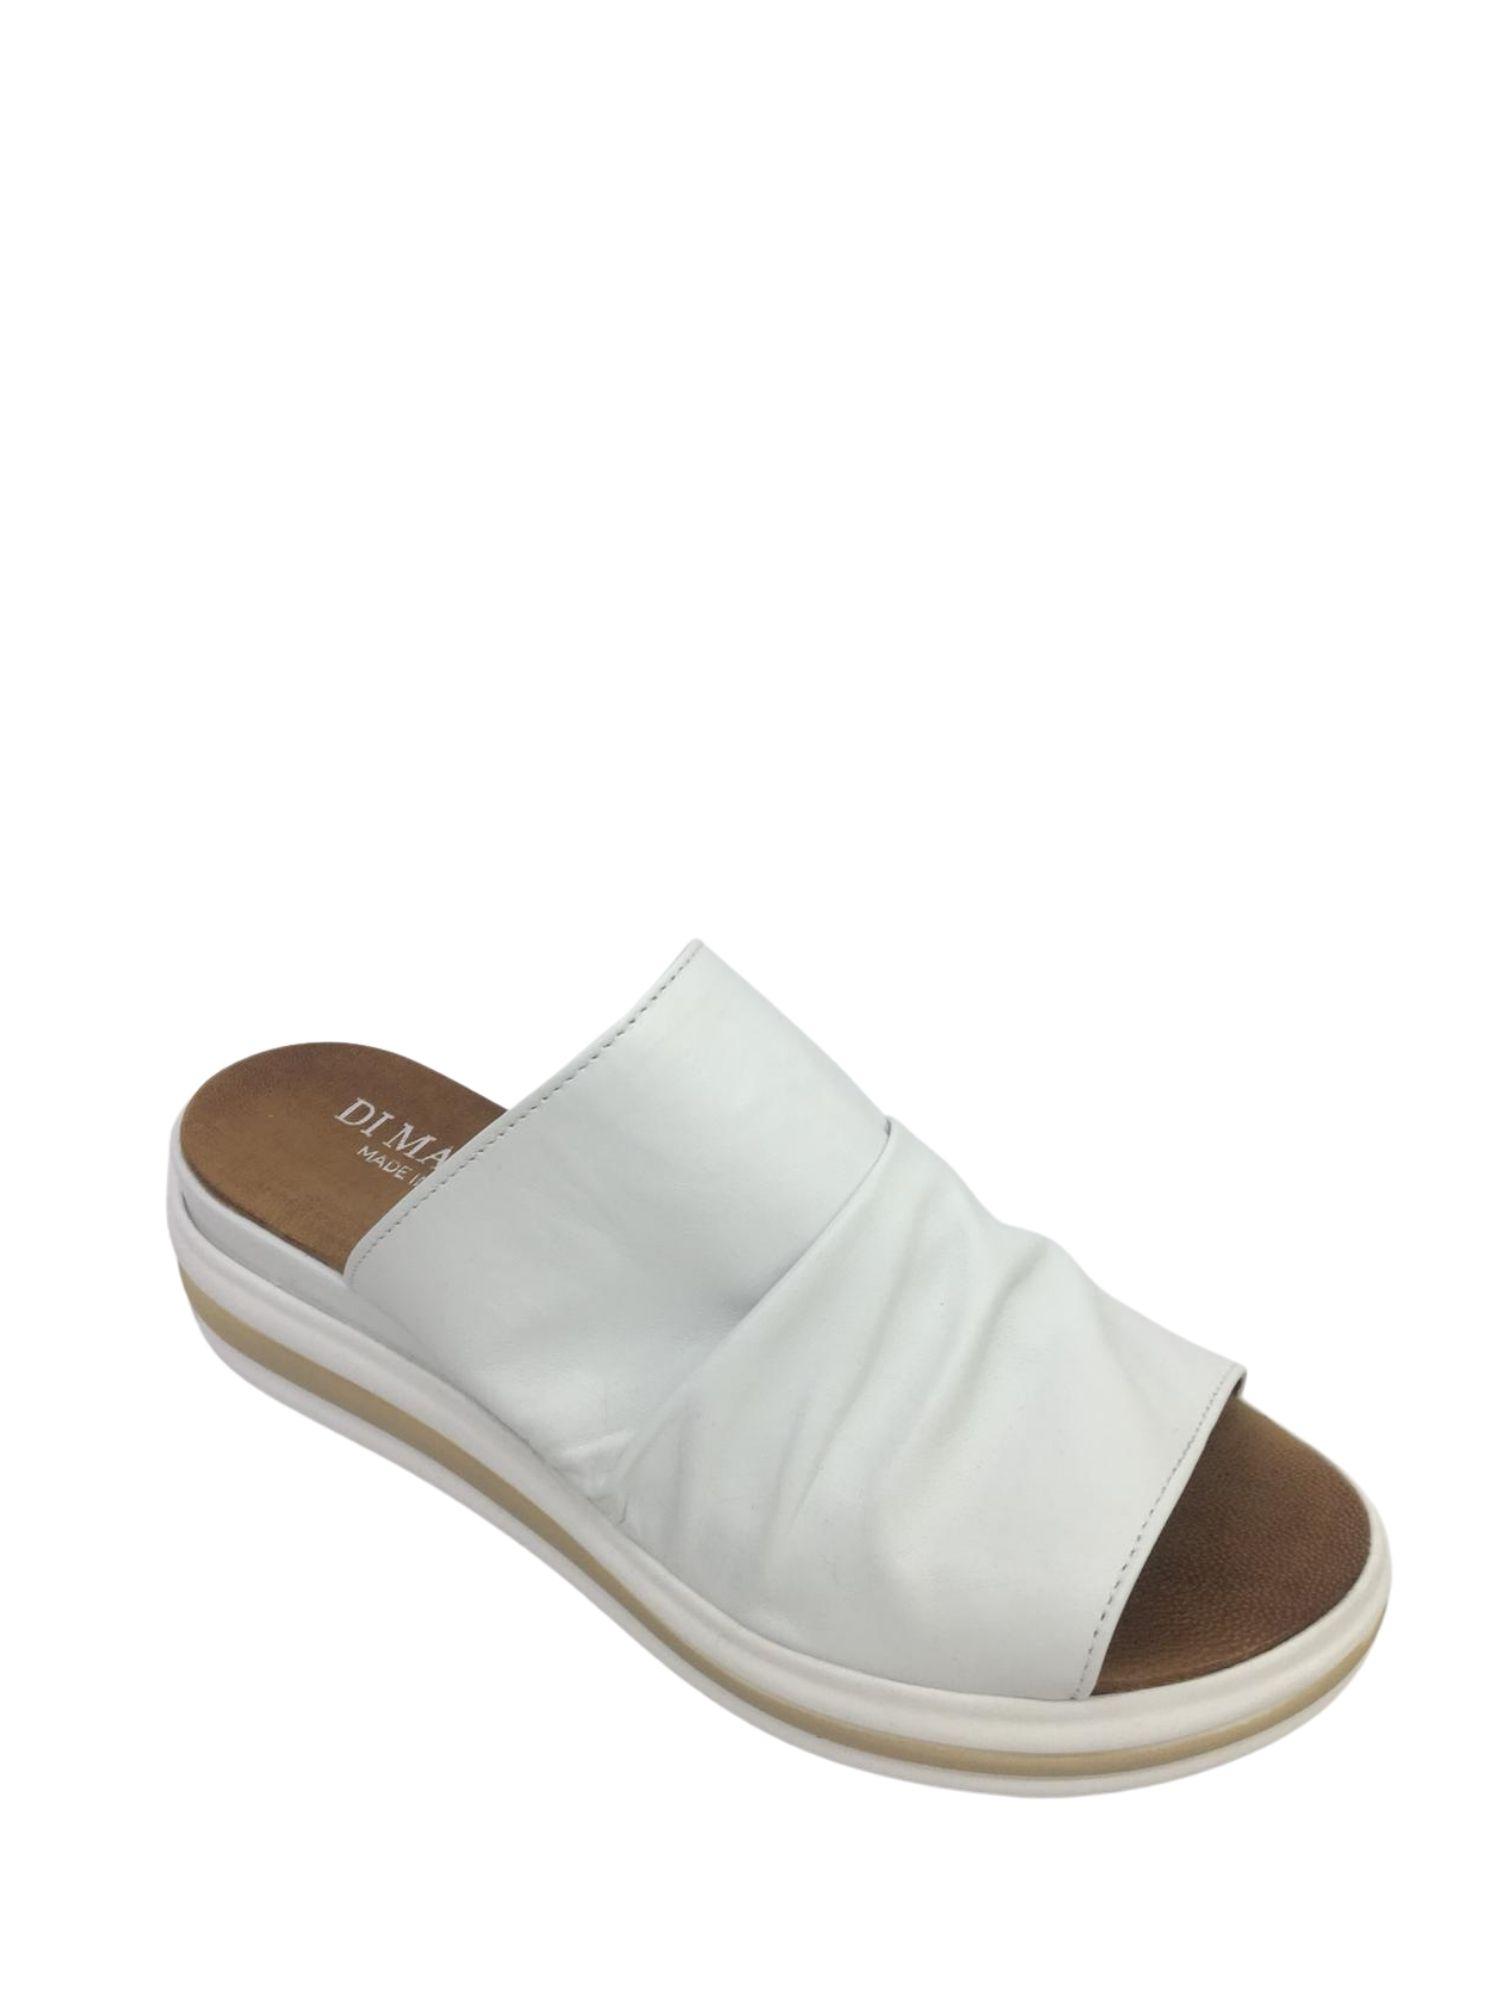 Sandalo Sabot Made in Italy 404 Bianco alto 2